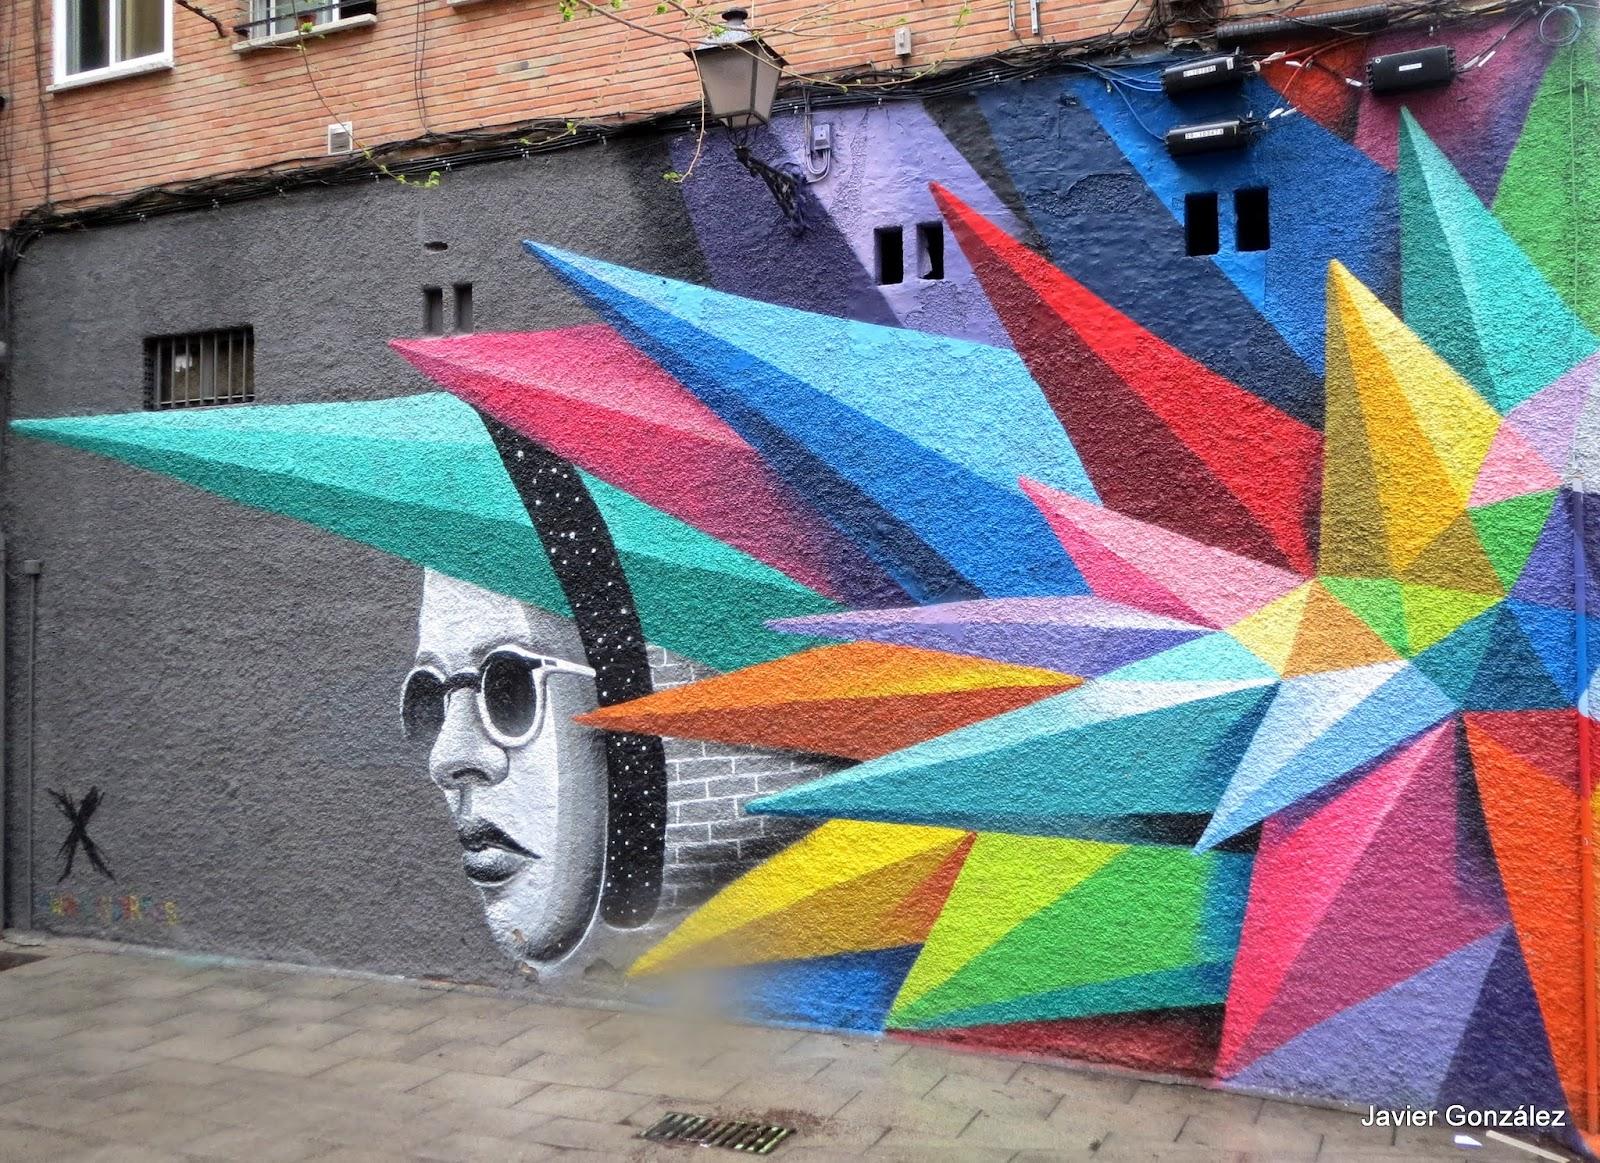 Calle Embajadores. Lavapiés. Madrid #cityscape. Mural